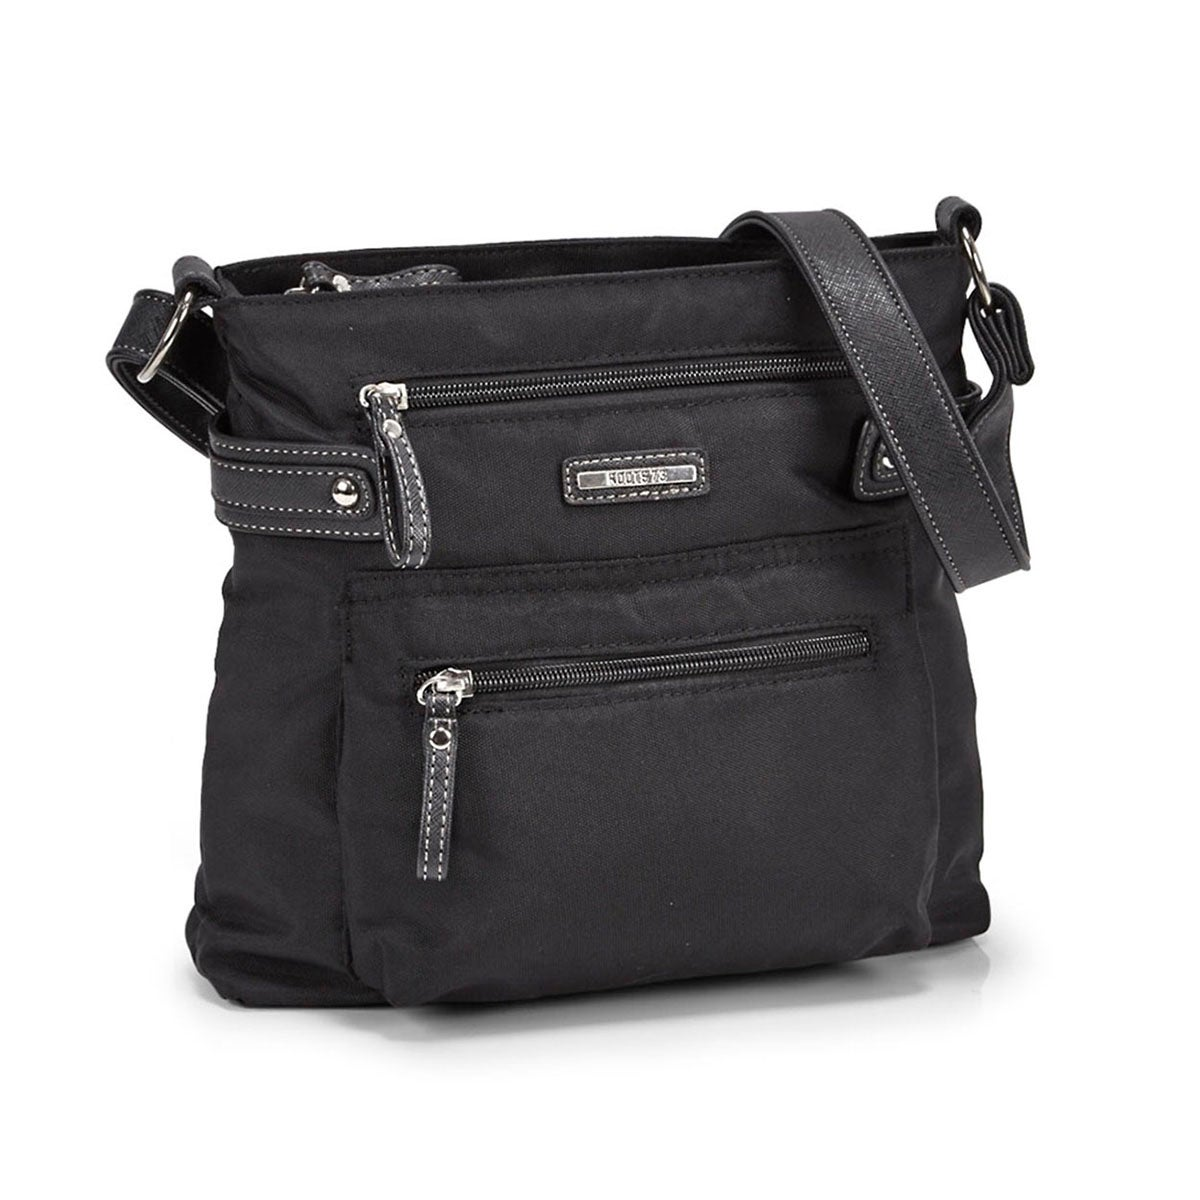 Women's R4301 black north/south cross body bag